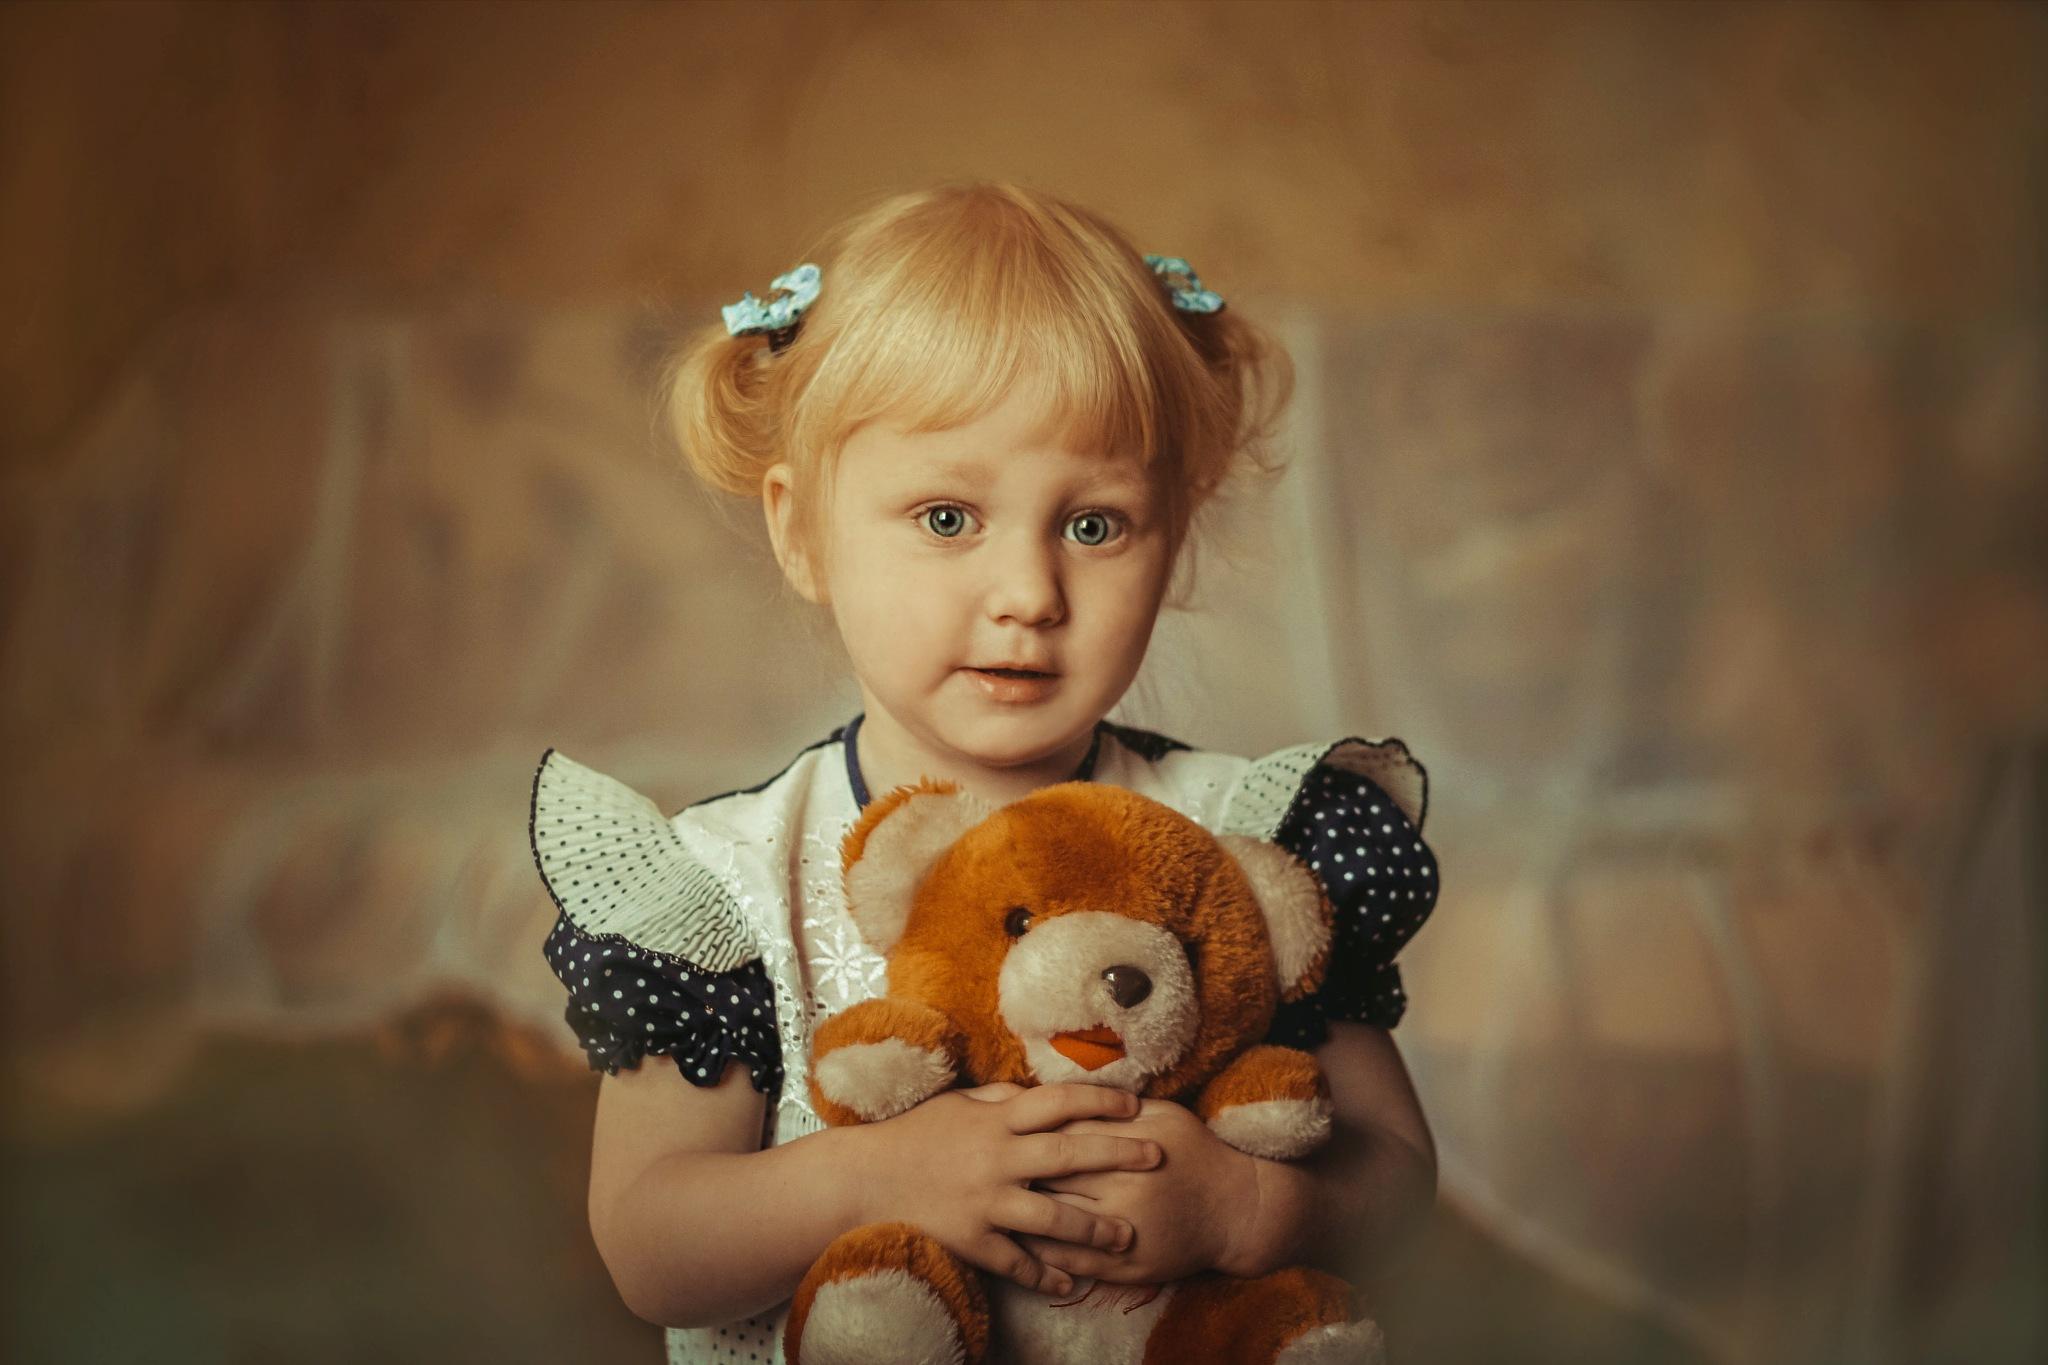 Girl and teddy bear by minimoy